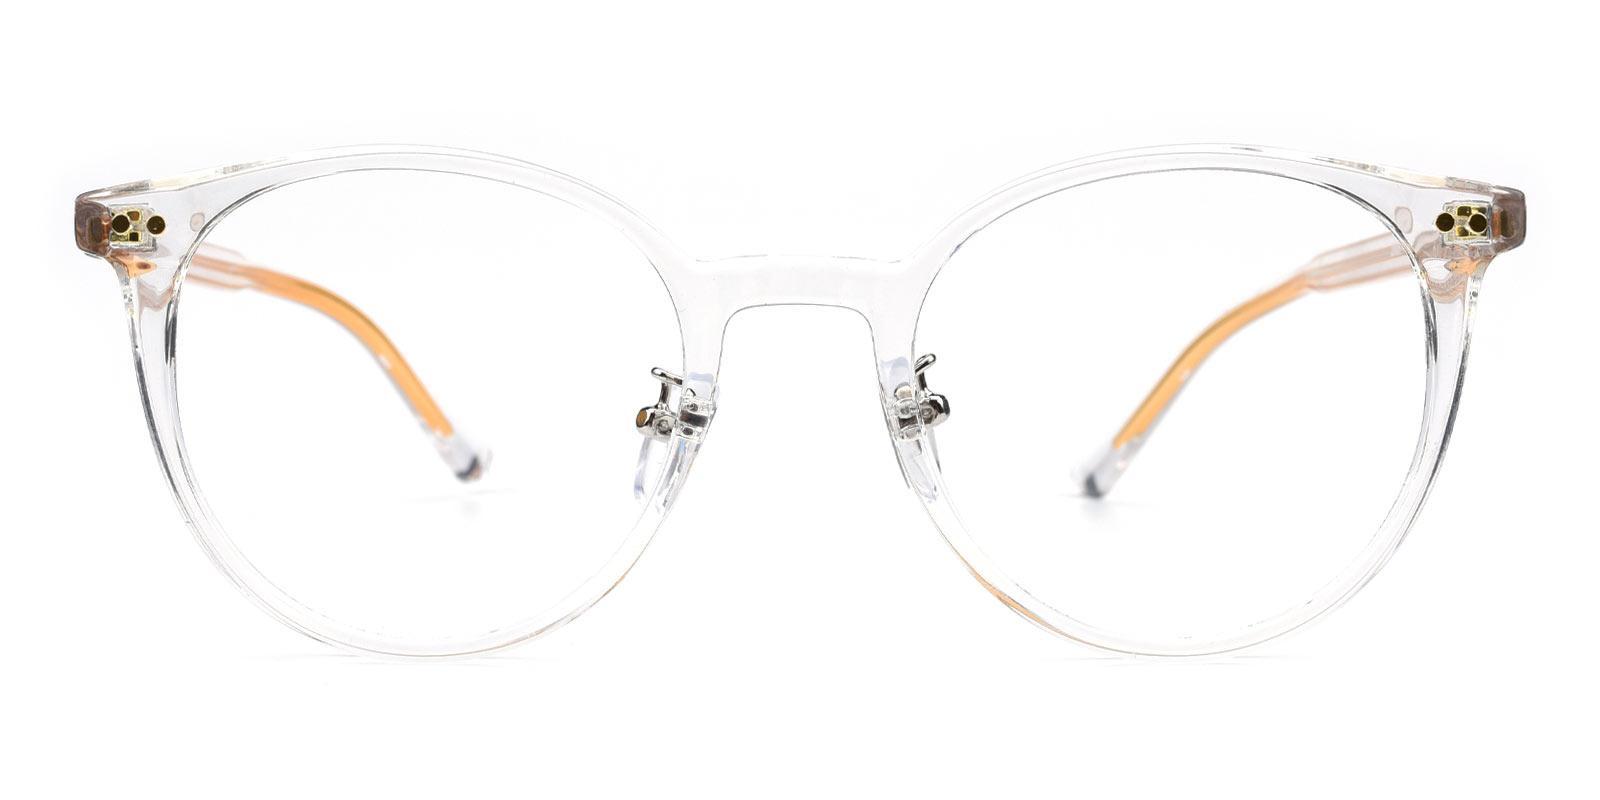 Adonia-Translucent-Round-Combination-Eyeglasses-additional2